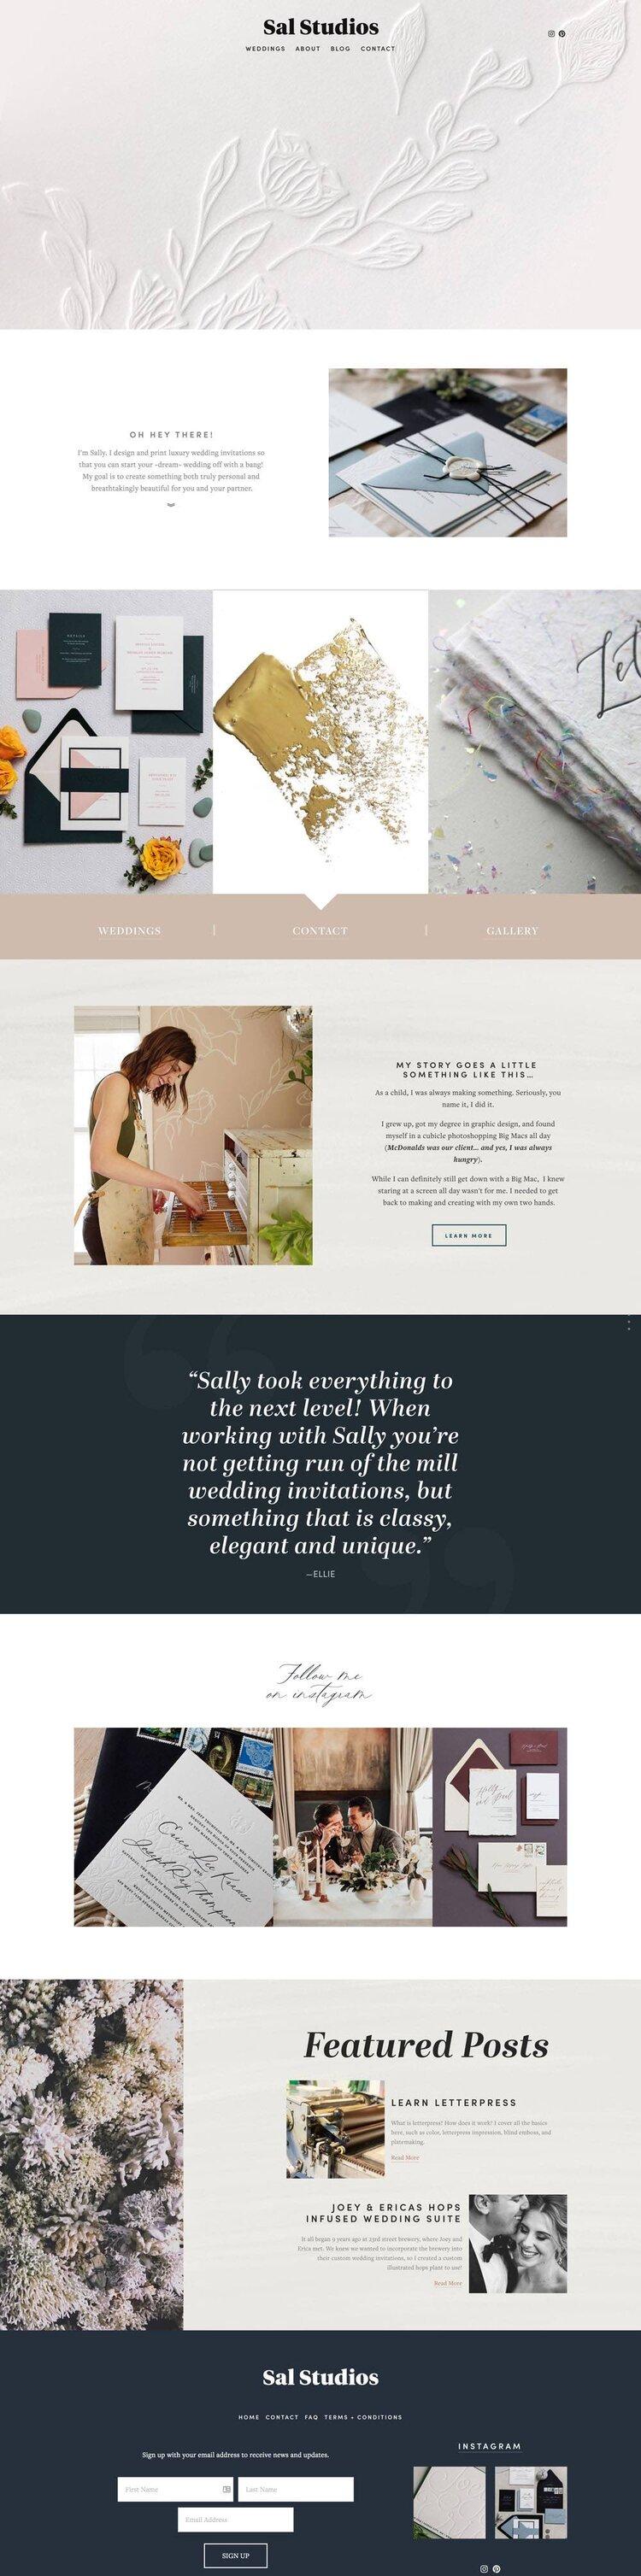 Big-Cat-Creative-Squarespace-Website-Template-Kits-Sophie-Showcase.jpg